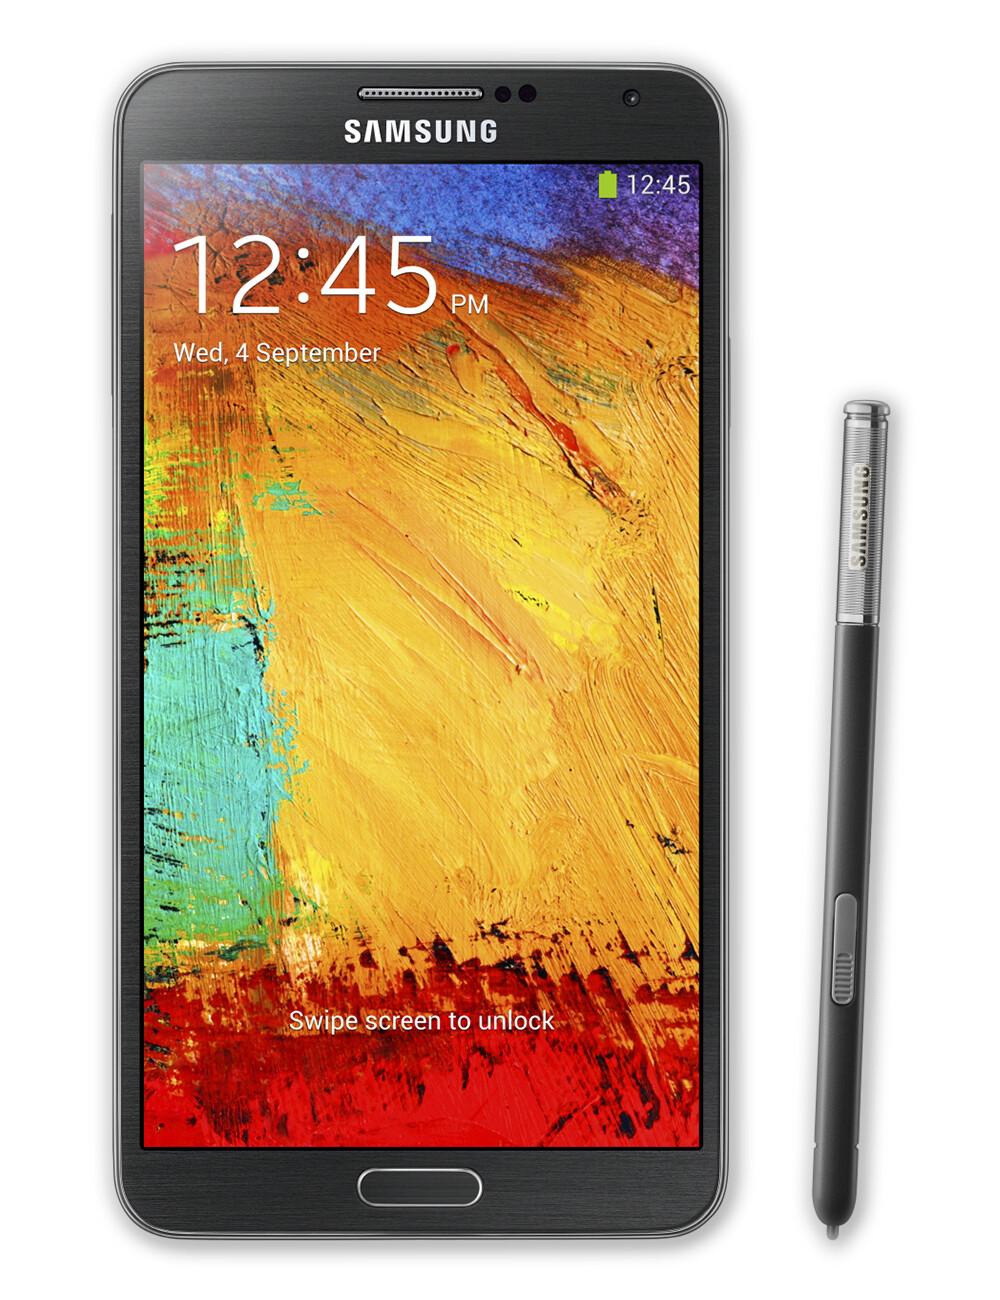 Samsung Galaxy Note 3 Photos